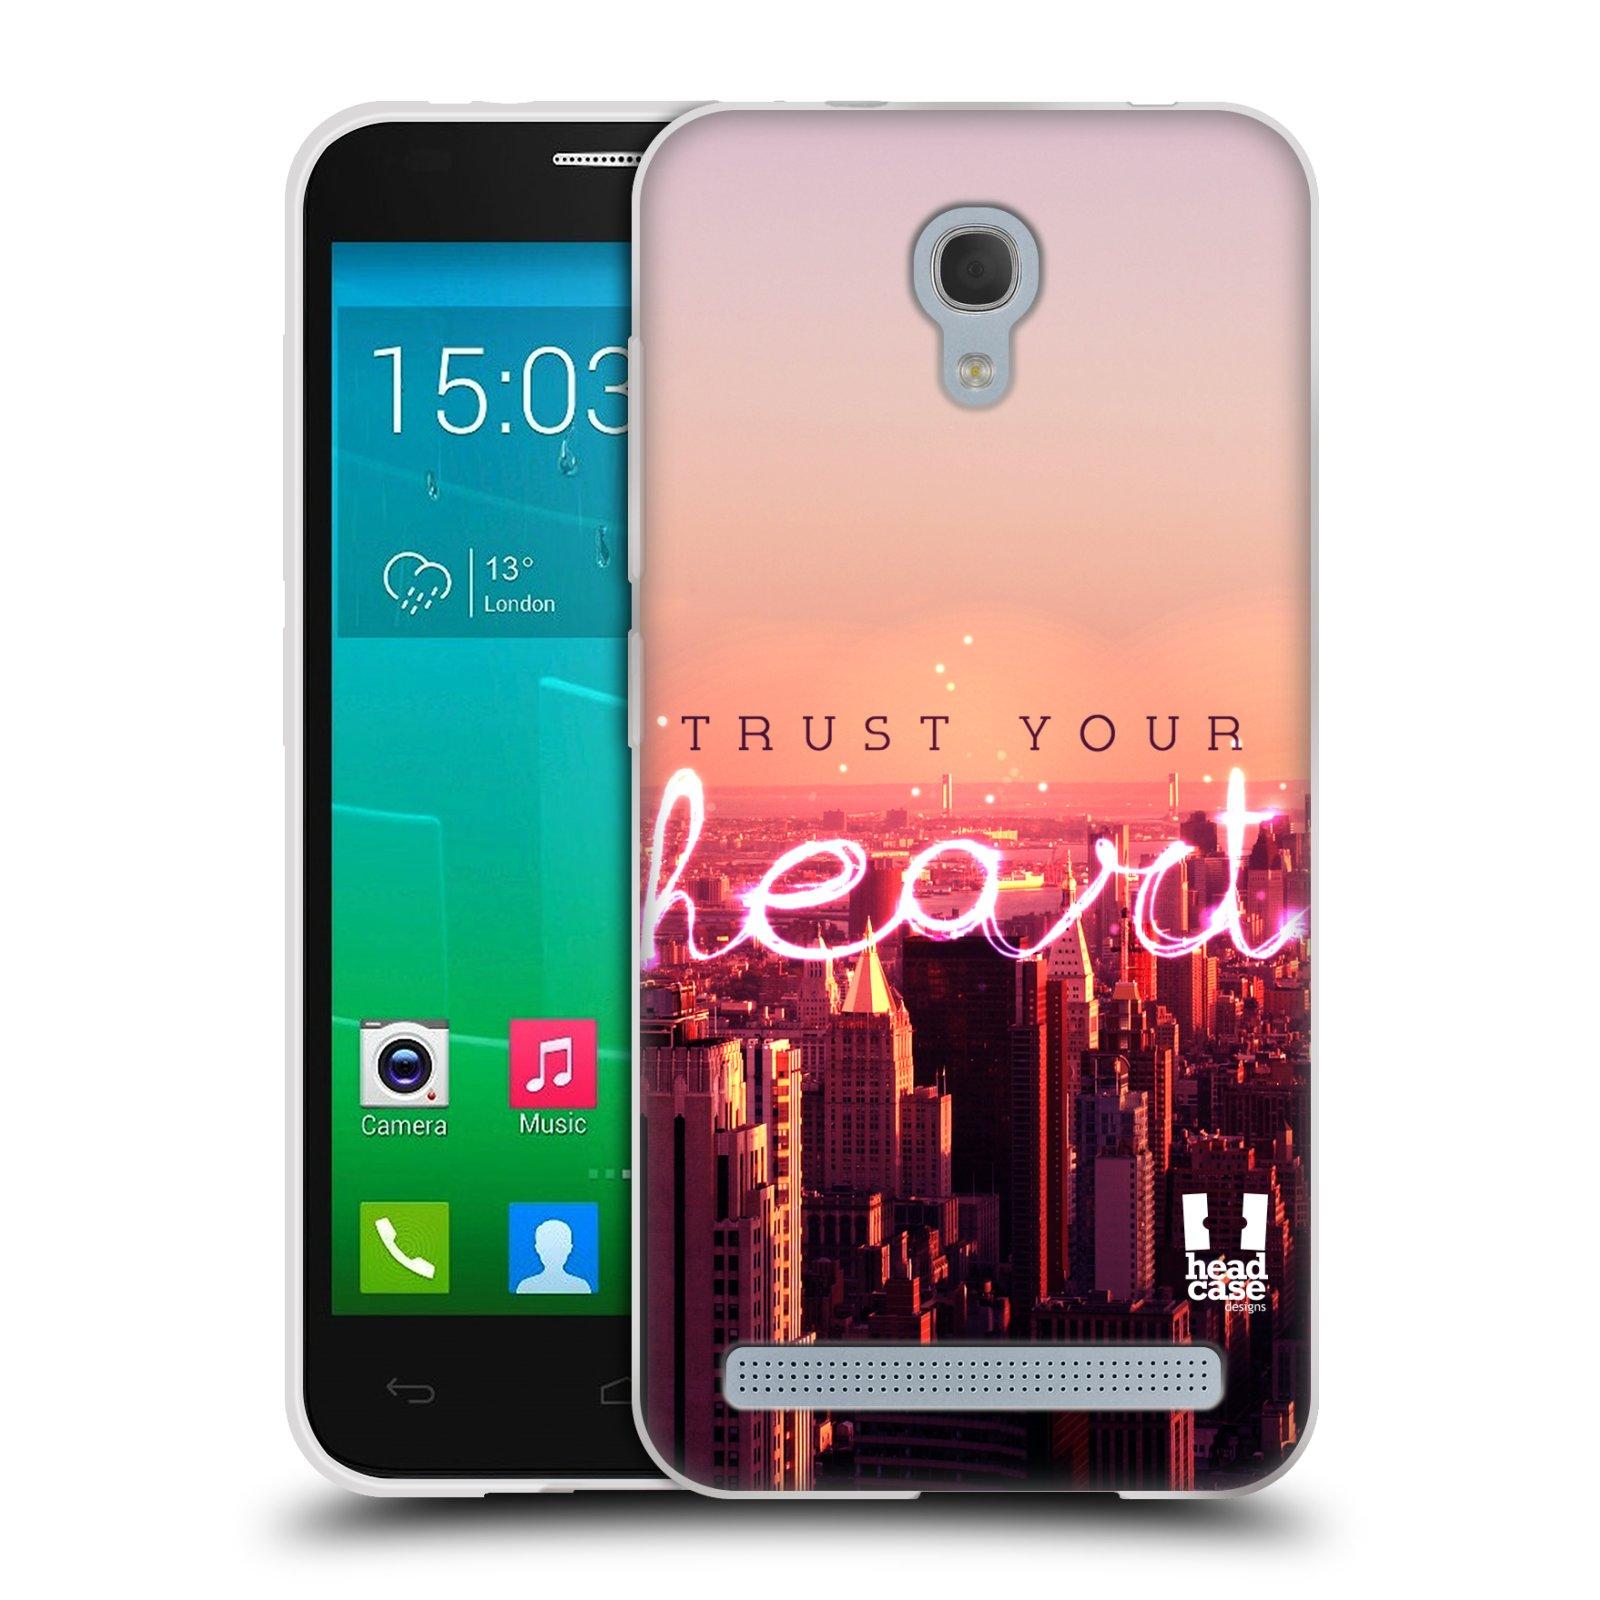 Silikonové pouzdro na mobil Alcatel One Touch Idol 2 Mini S 6036Y HEAD CASE TRUST YOUR HEART (Silikonový kryt či obal na mobilní telefon Alcatel Idol 2 Mini S OT-6036Y)